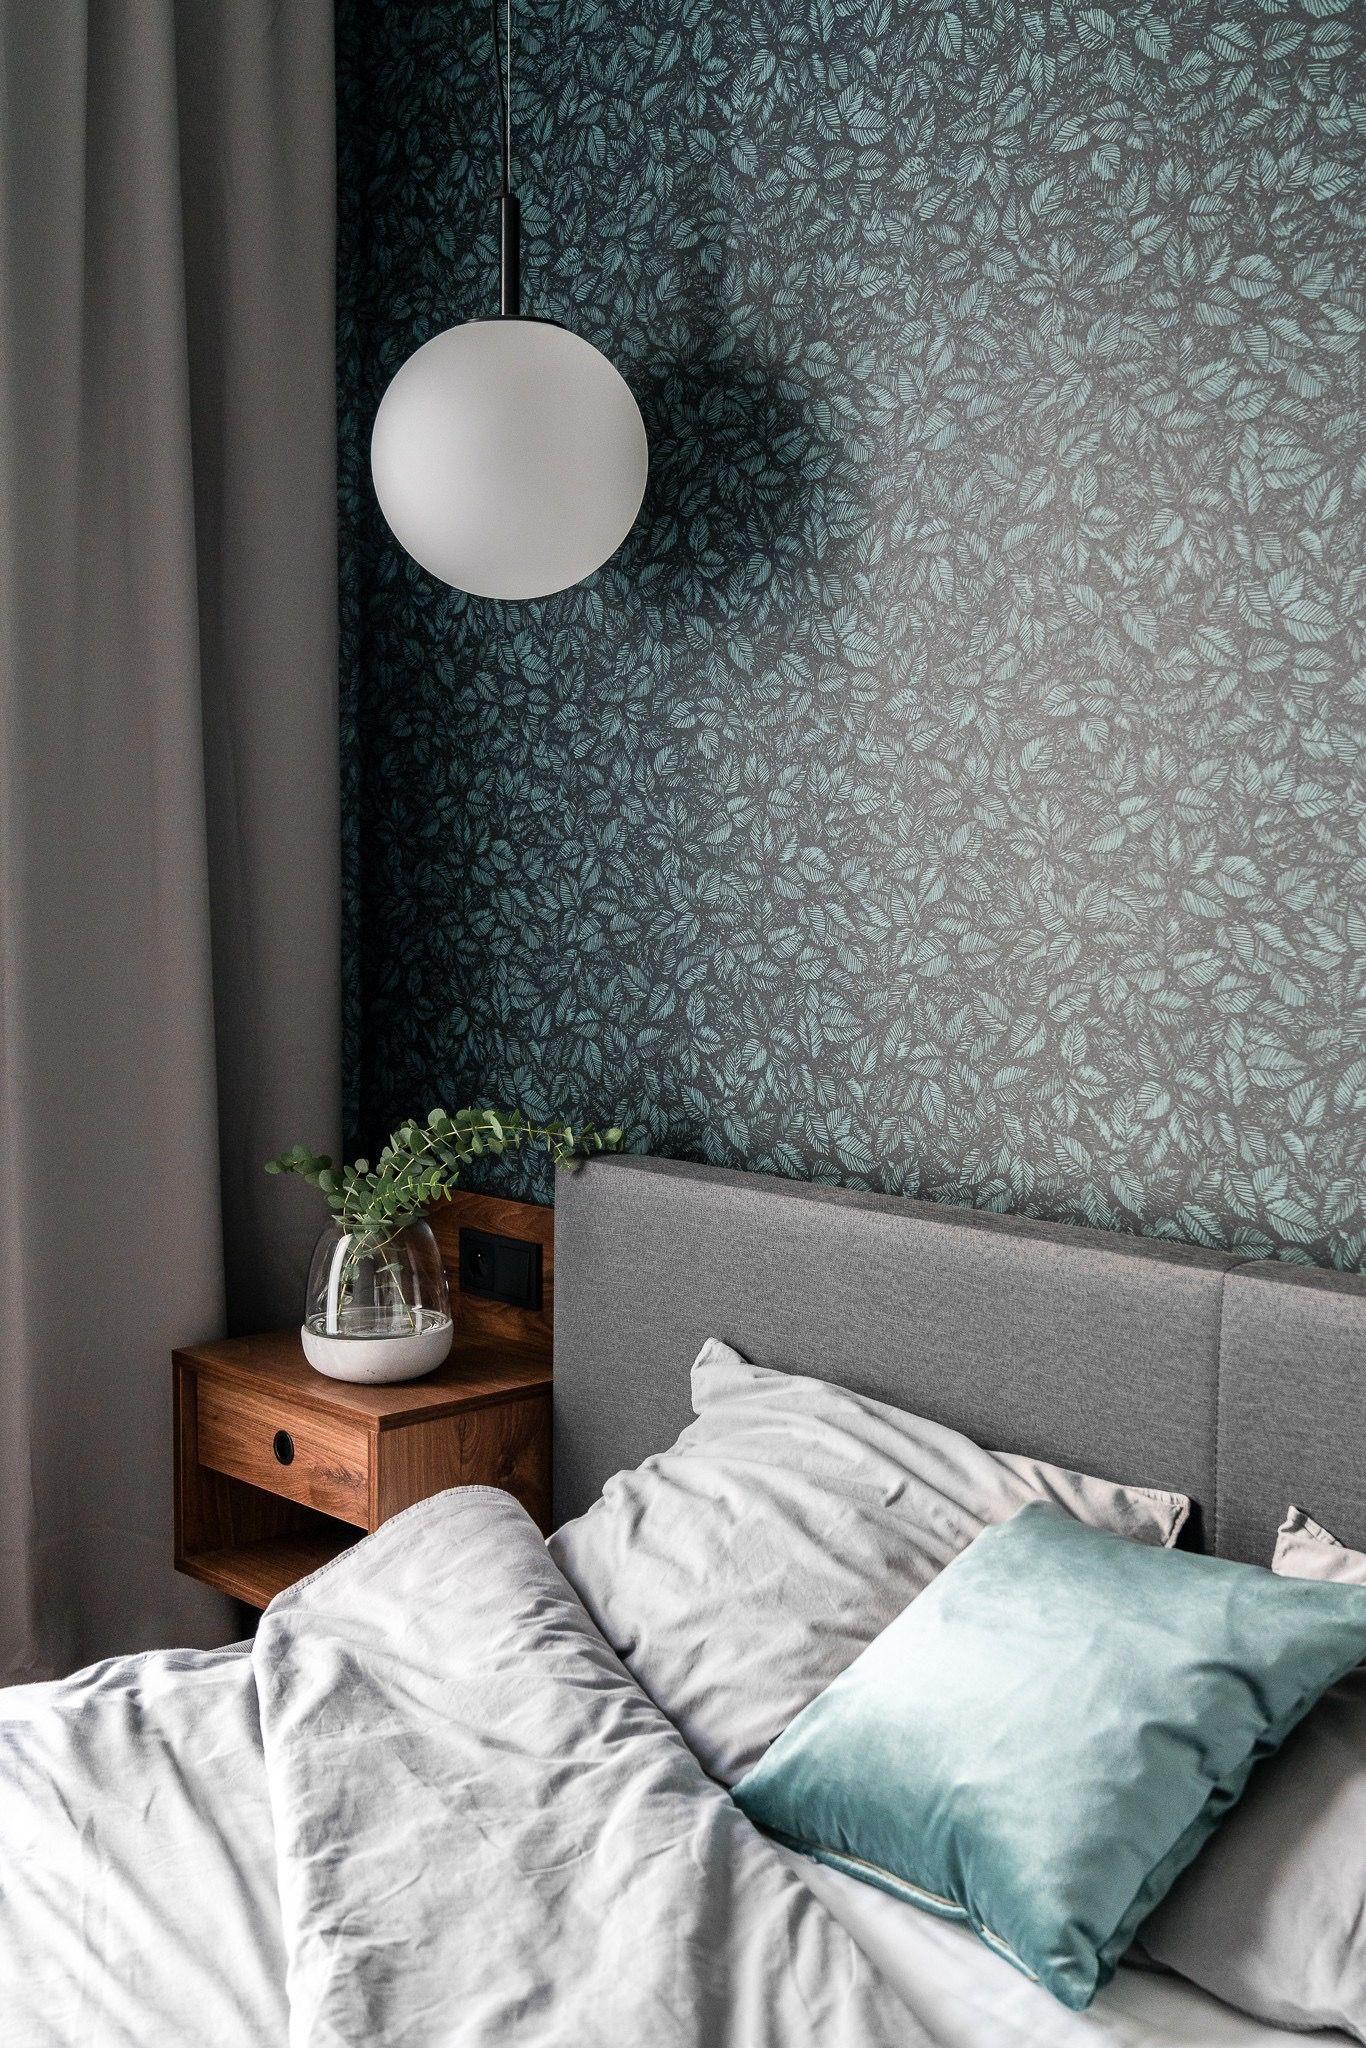 Leaves Wallpaper In Bedroom Bedroom Interior Small Room Design